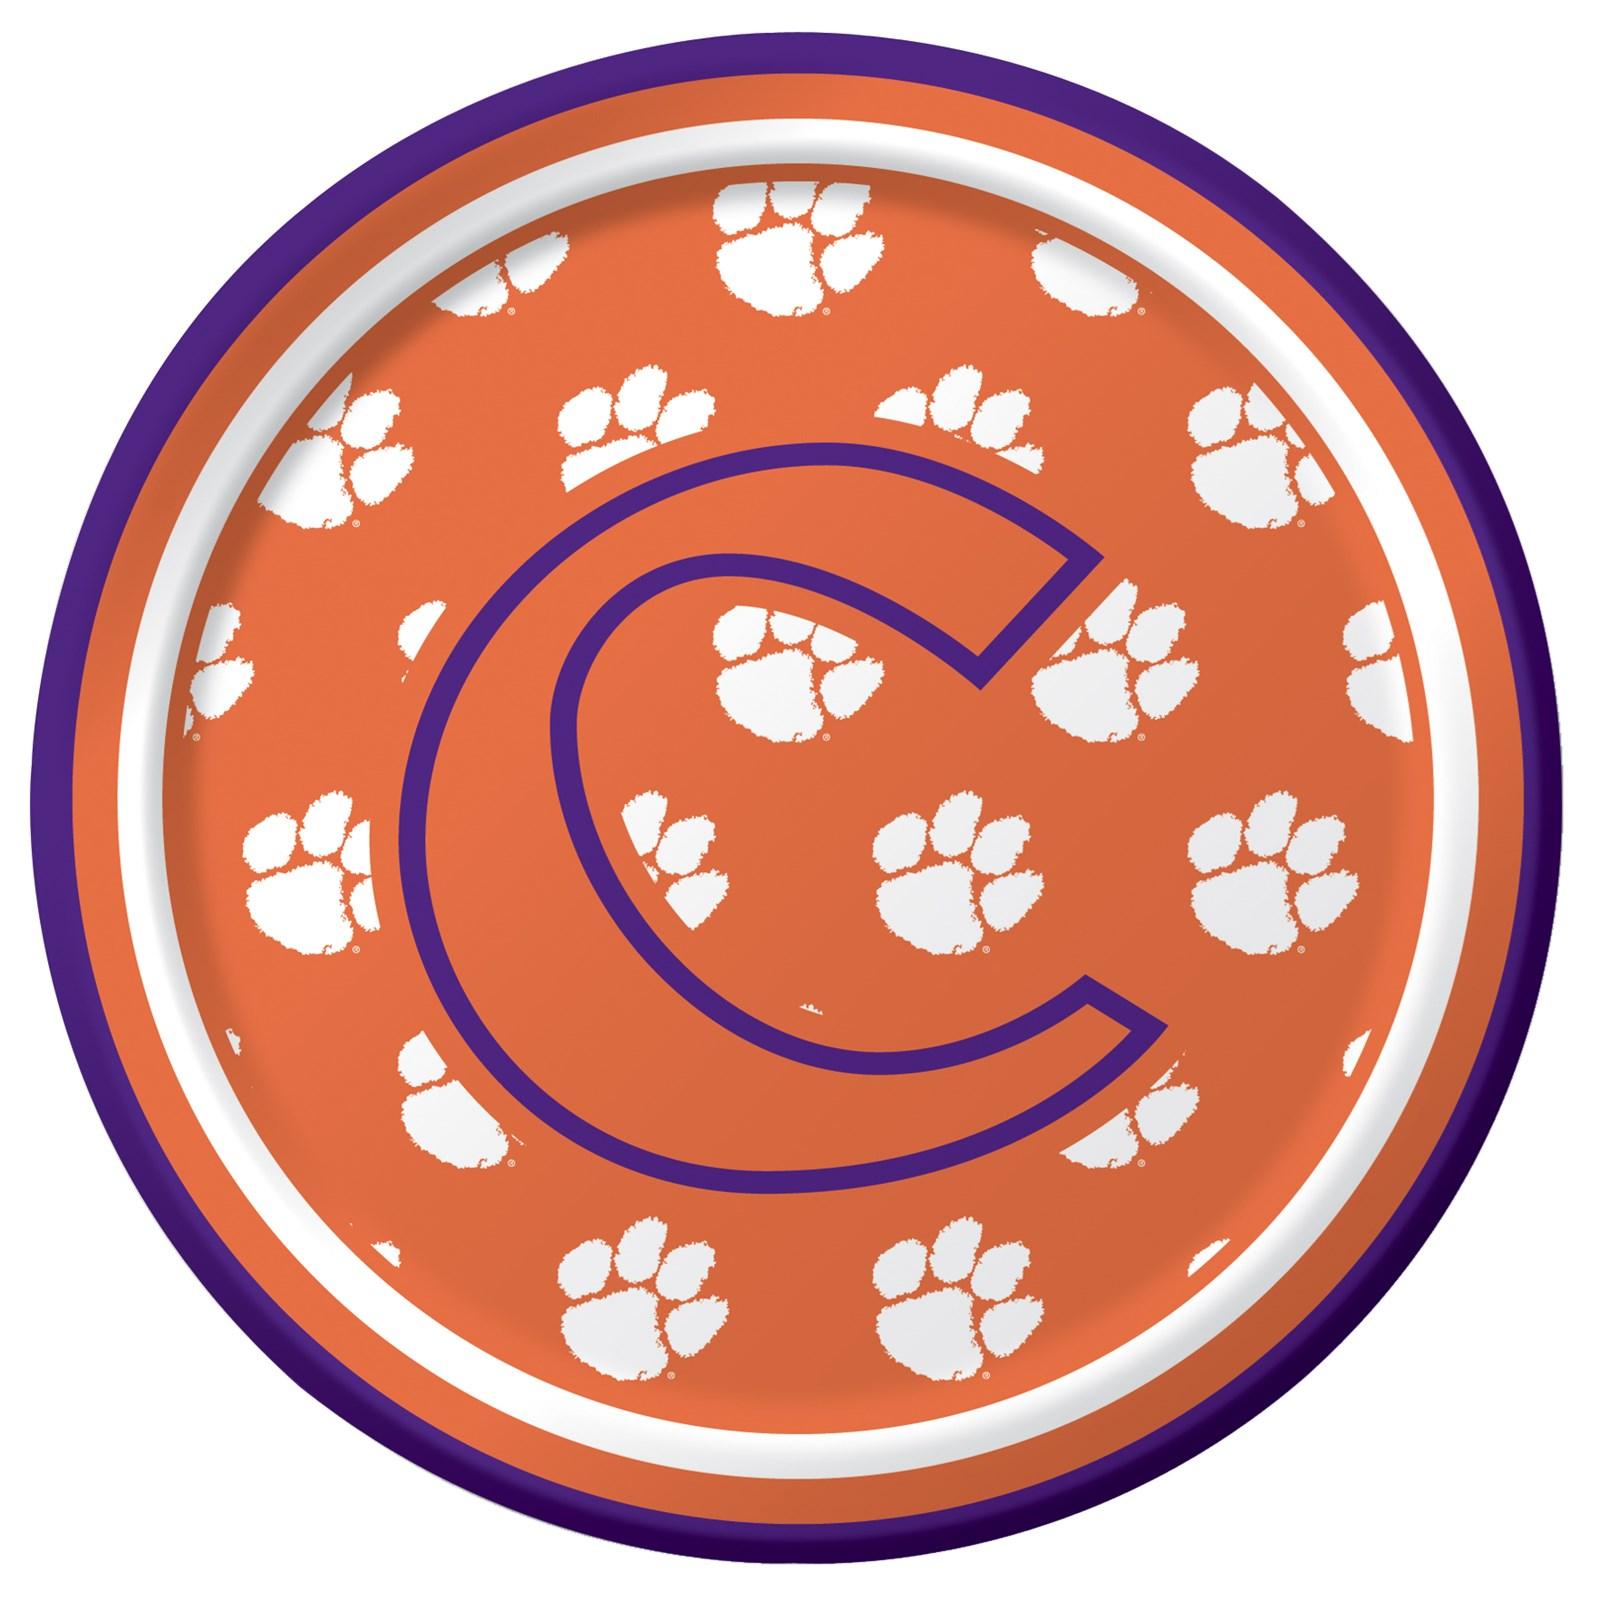 Image of Clemson Tigers - Dessert Plates (8 count)